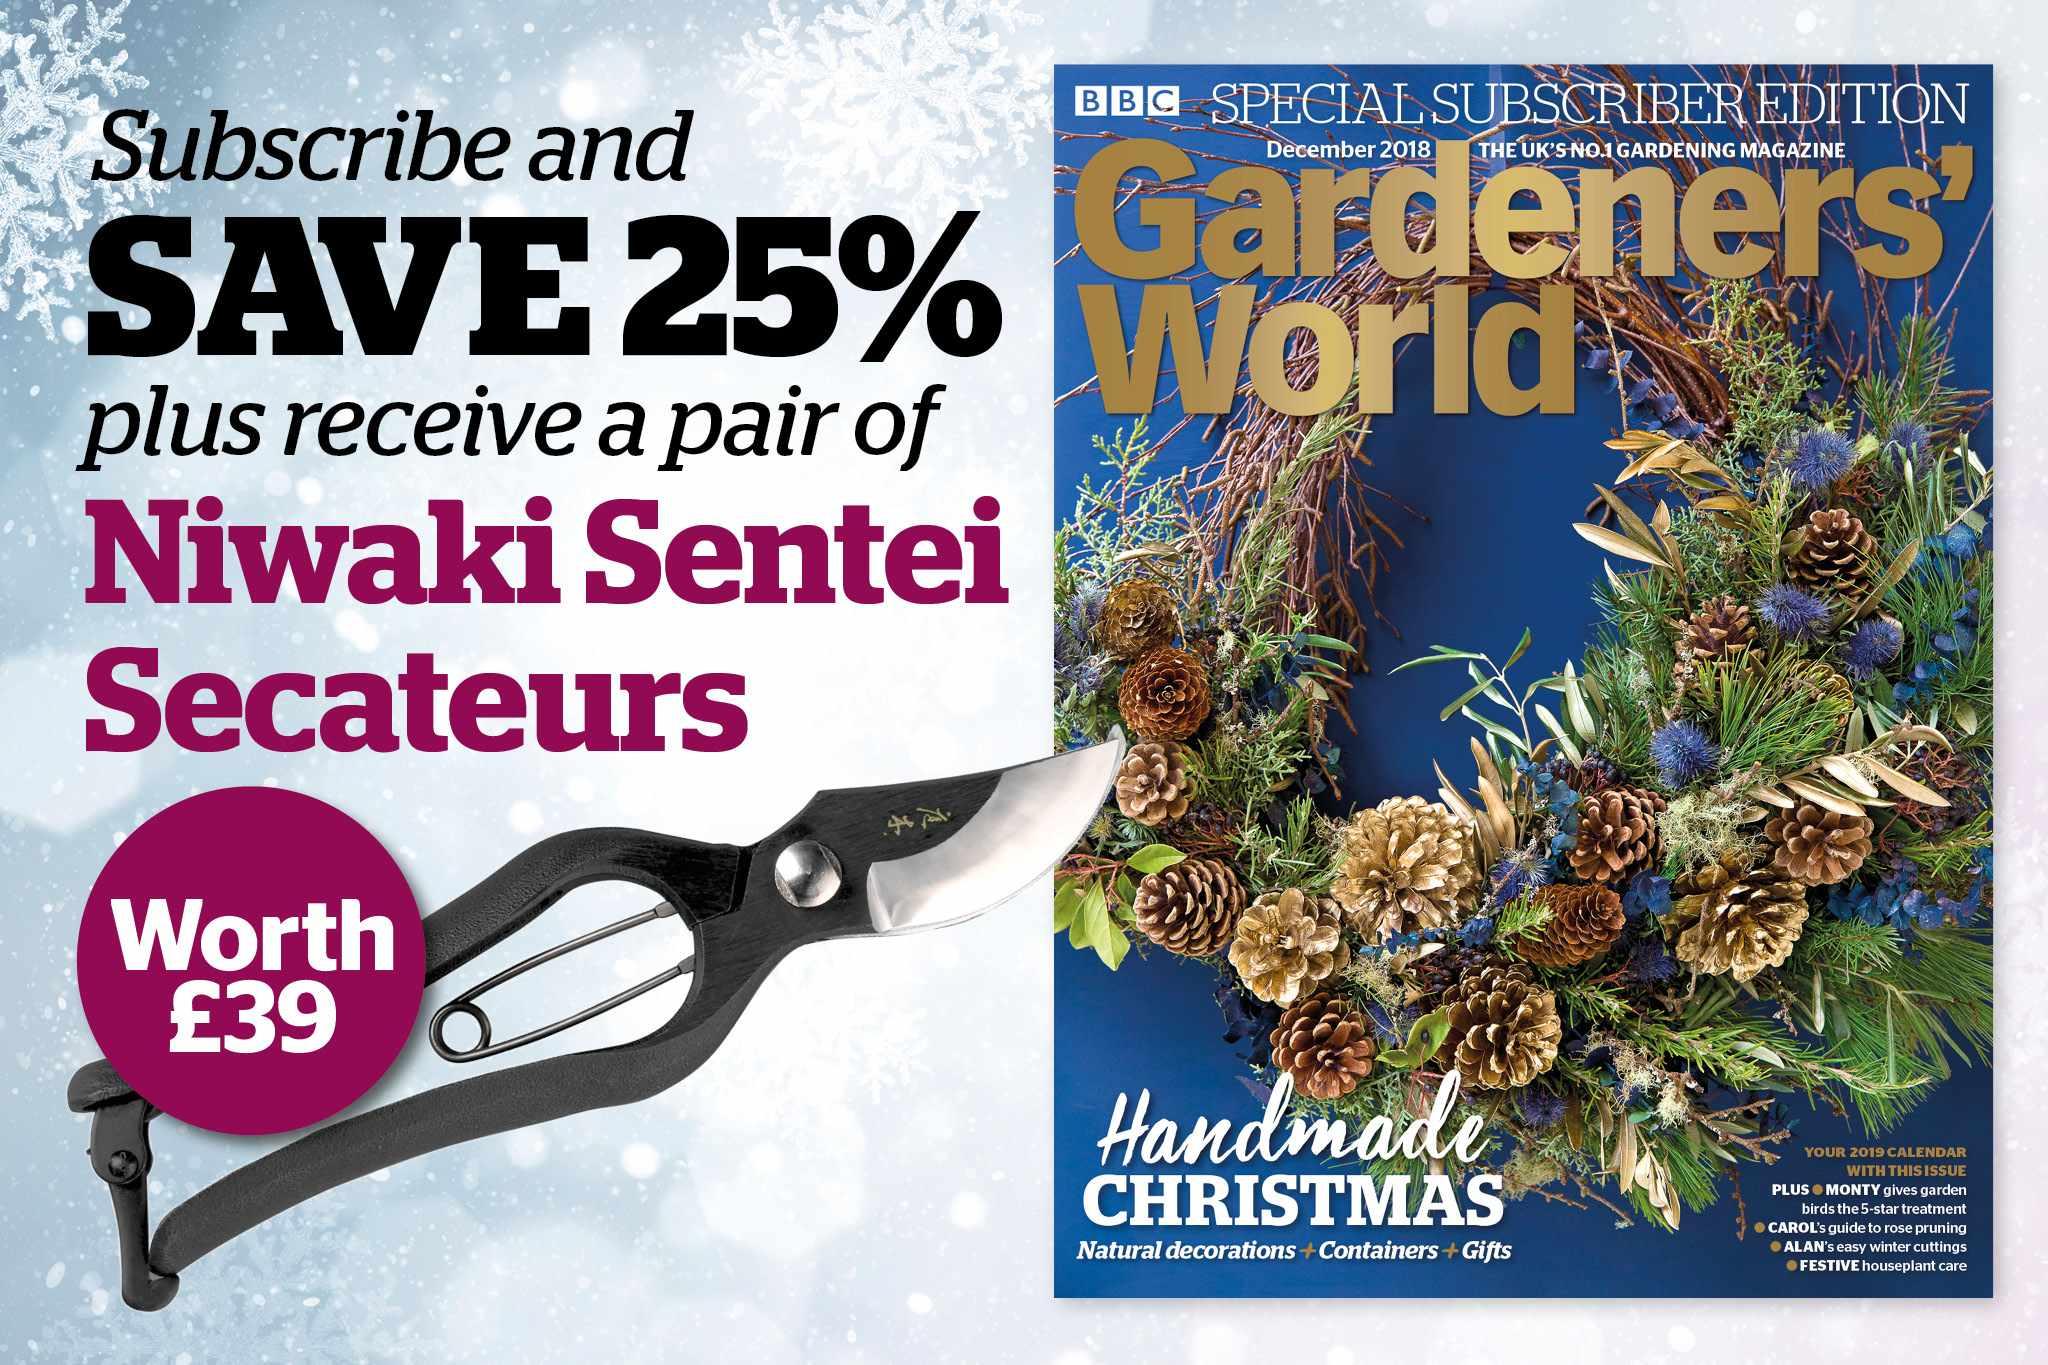 BBC Gardeners' World Magazine, £44.99, comes with Niwaki Sentei Secateurs worth £39